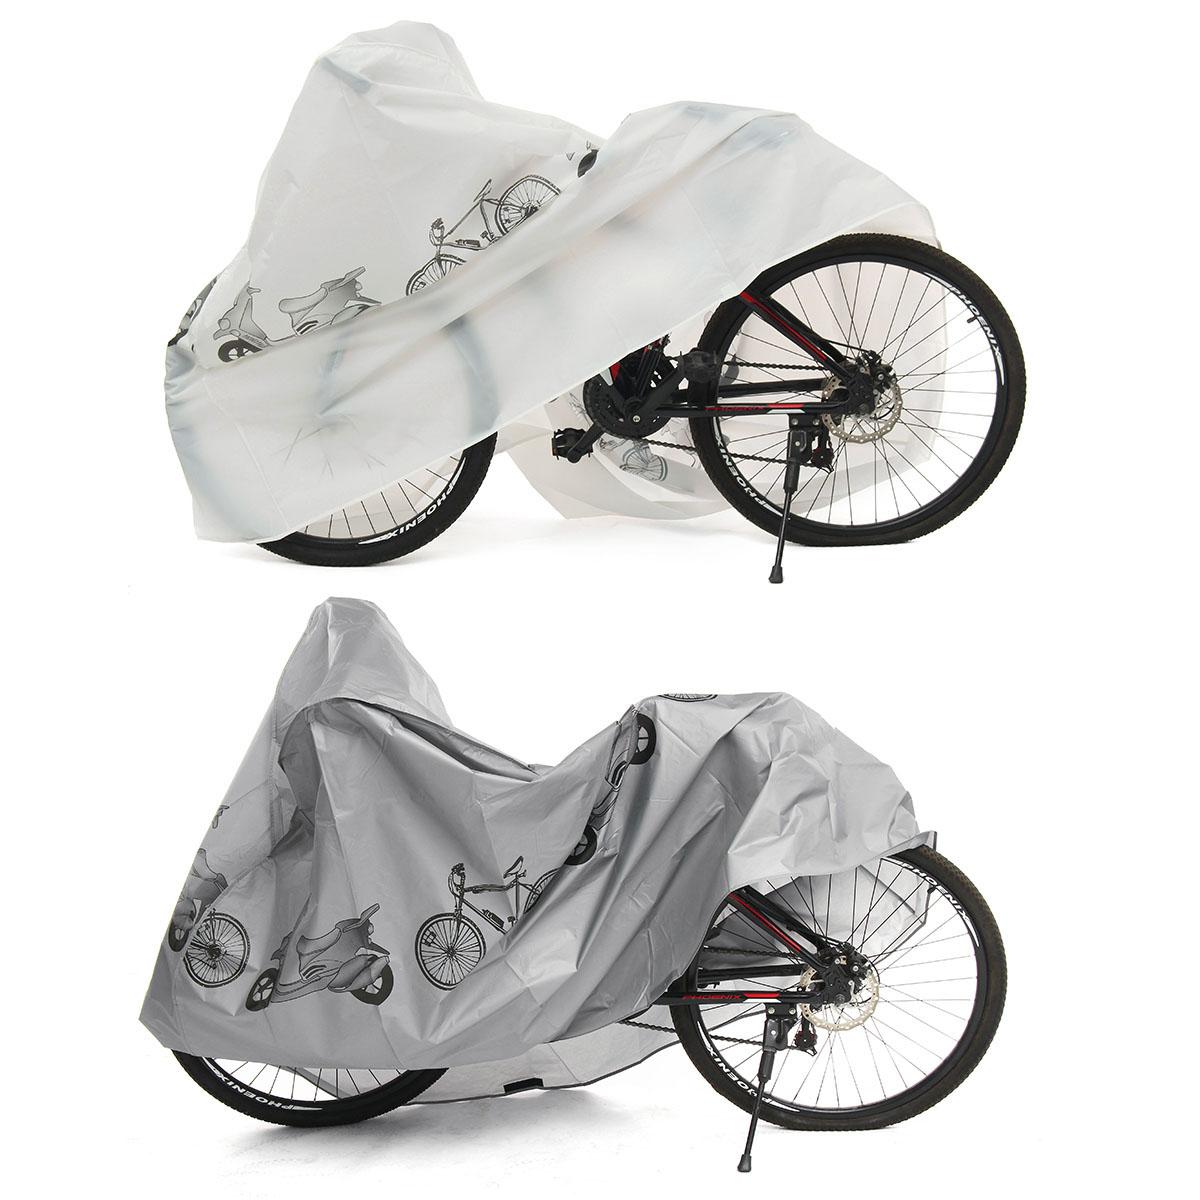 Велосипед Велосипед мотоцикл Чехол Водонепроницаемы Анти UV Погода пыленепроницаемая - фото 1